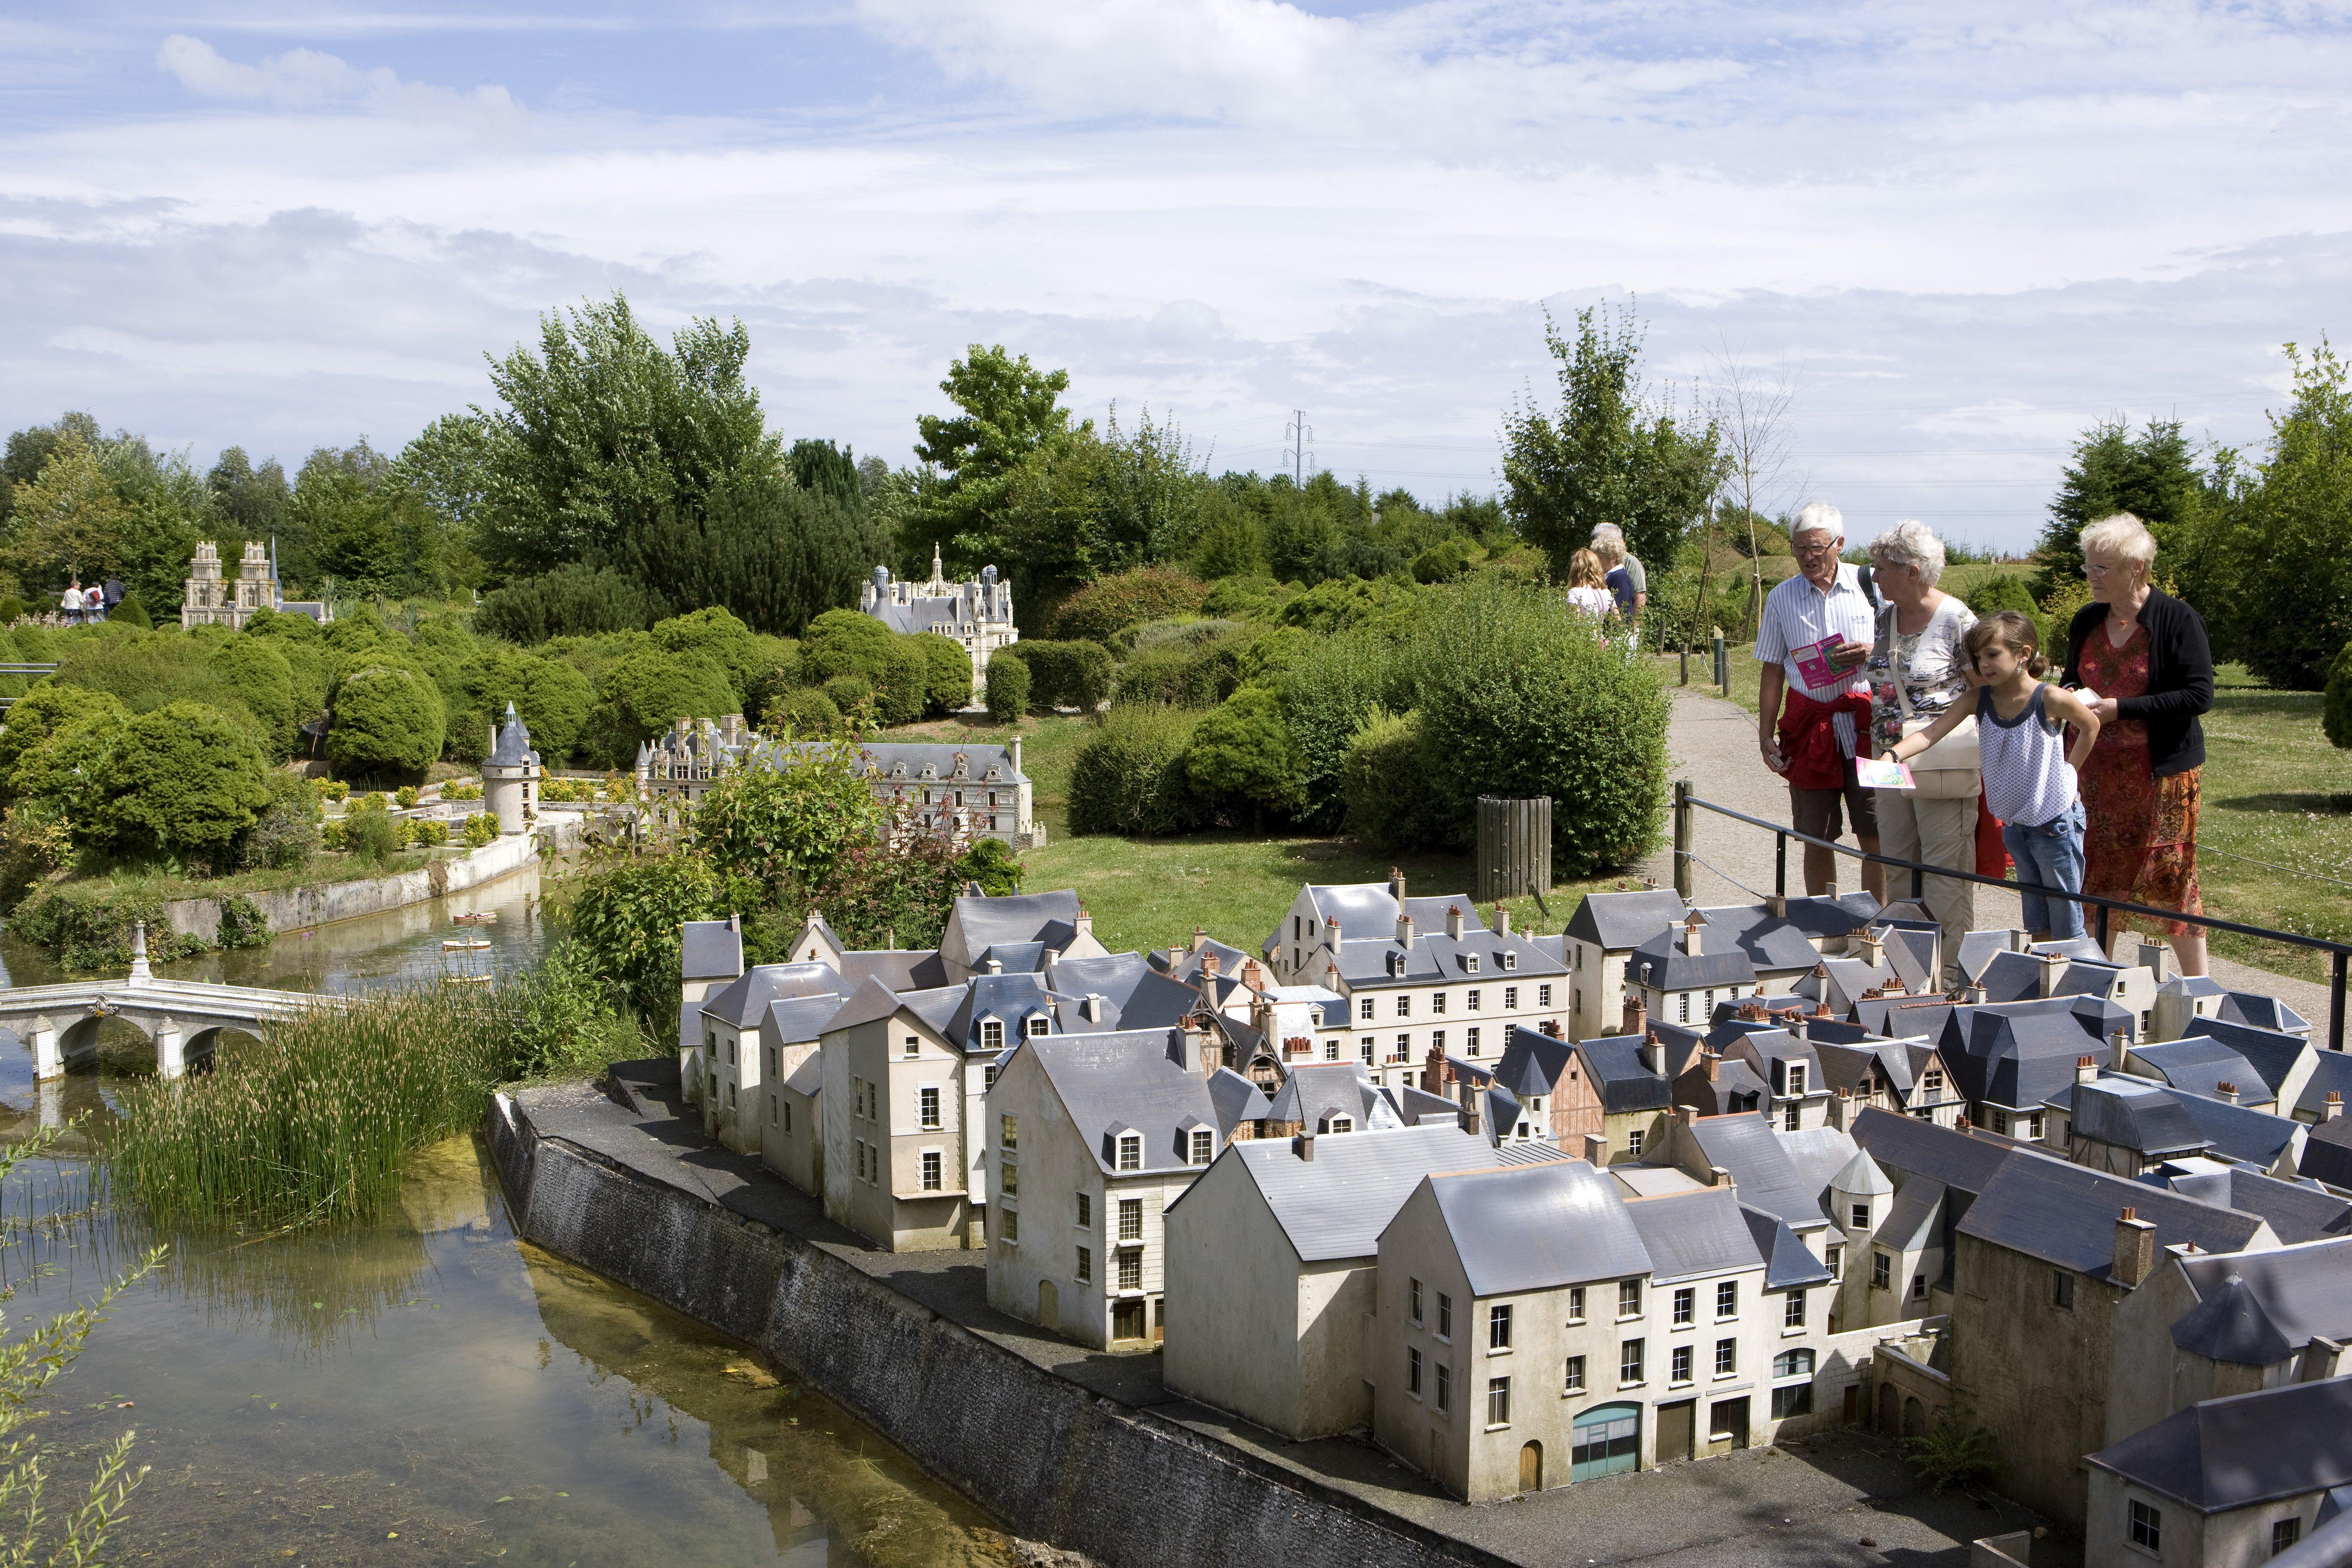 6 juillet 2009. France Miniature.